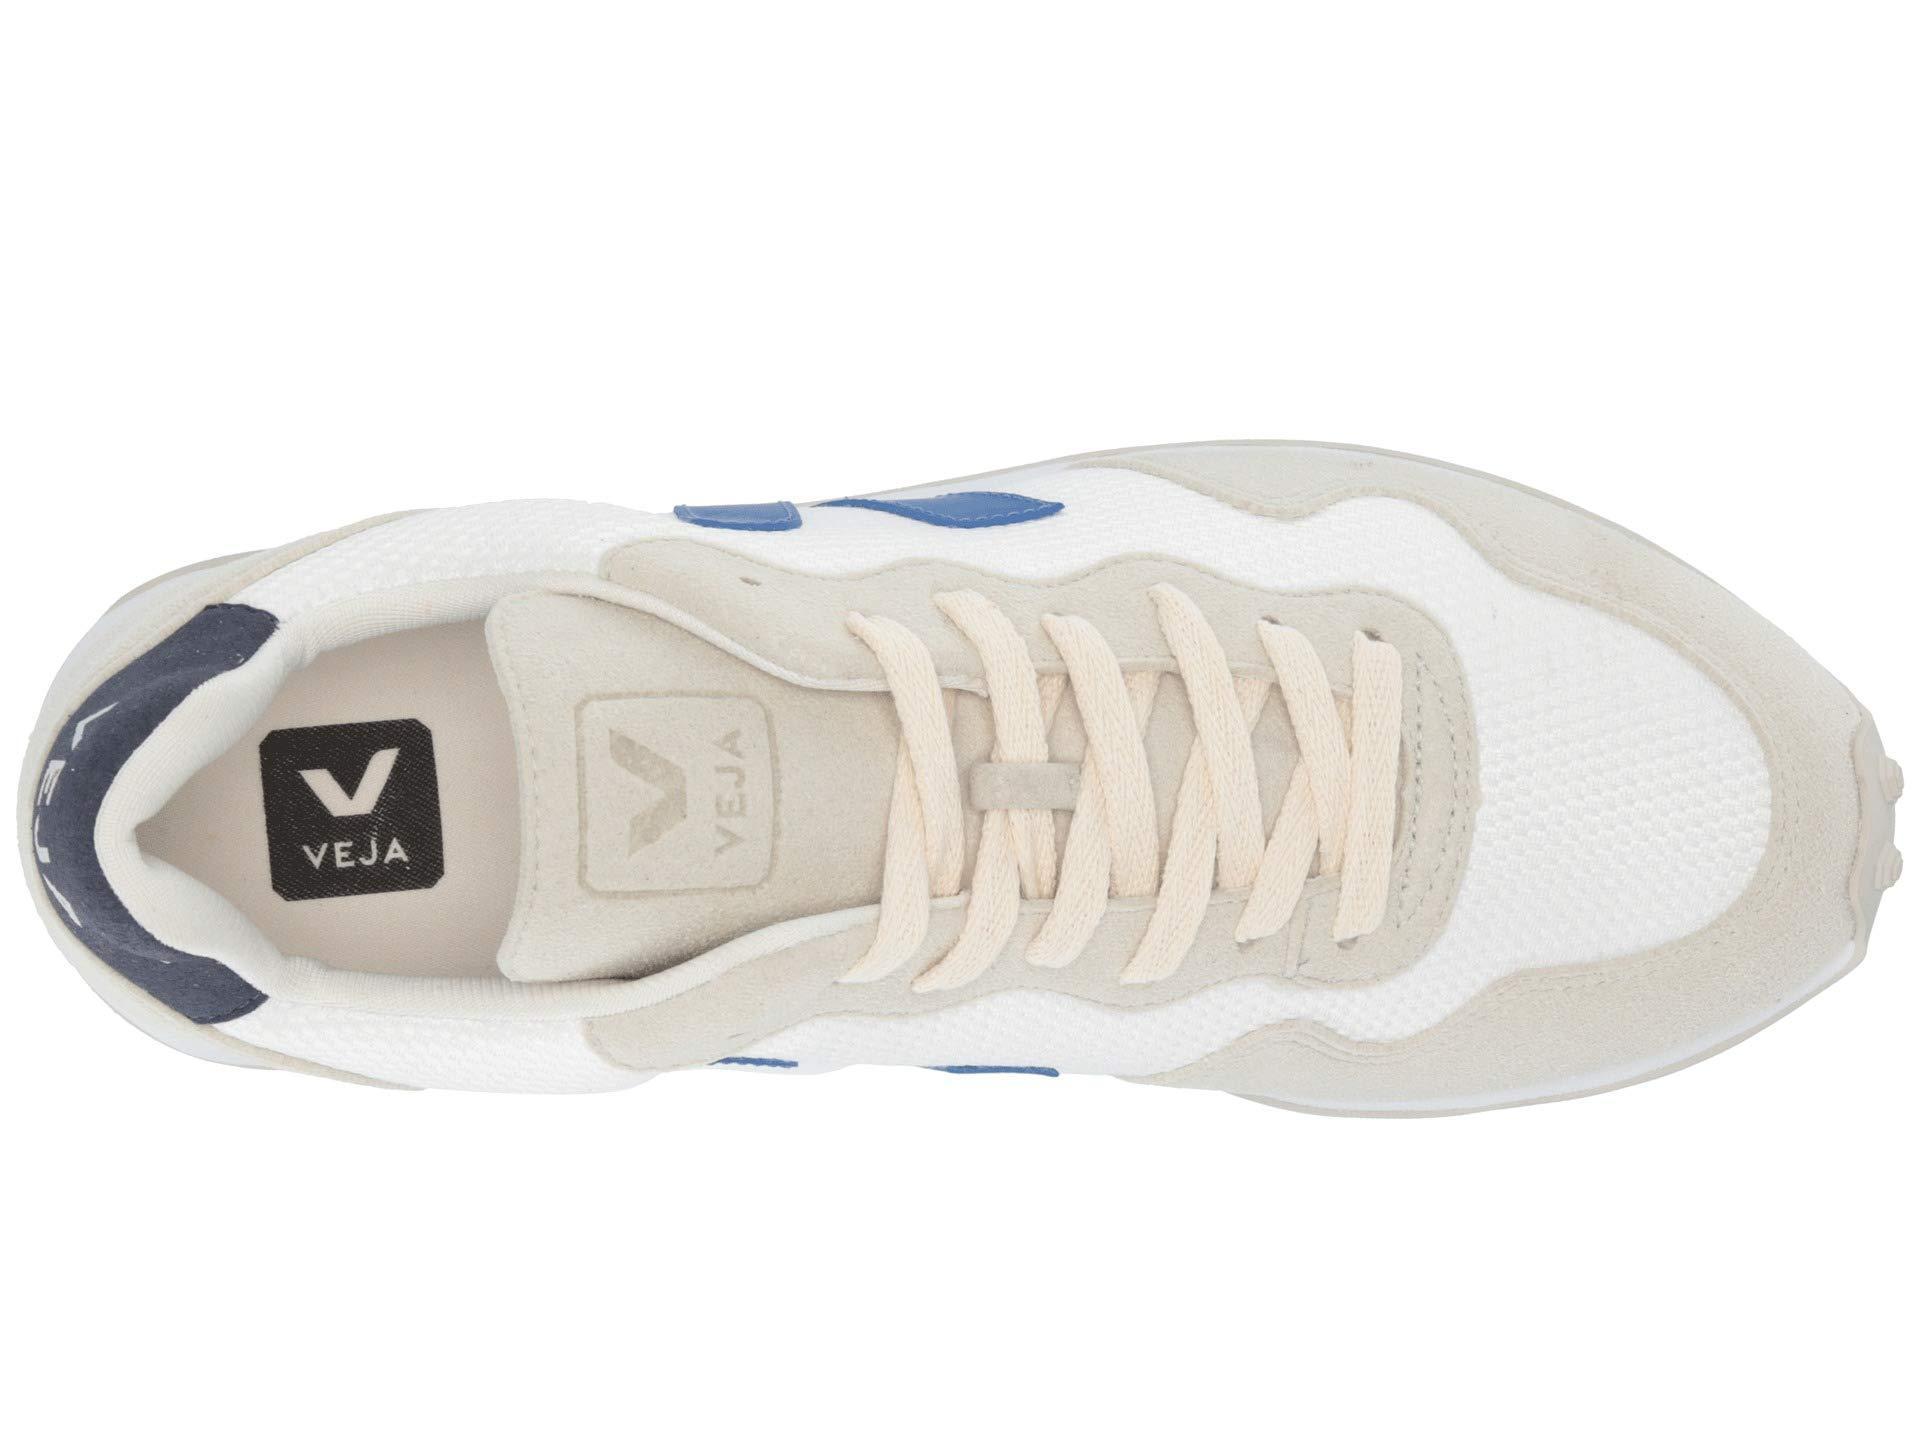 Hexawhiteindigonautico In MeshMen's B Veja Sdu Lyst Shoes wO08knPX